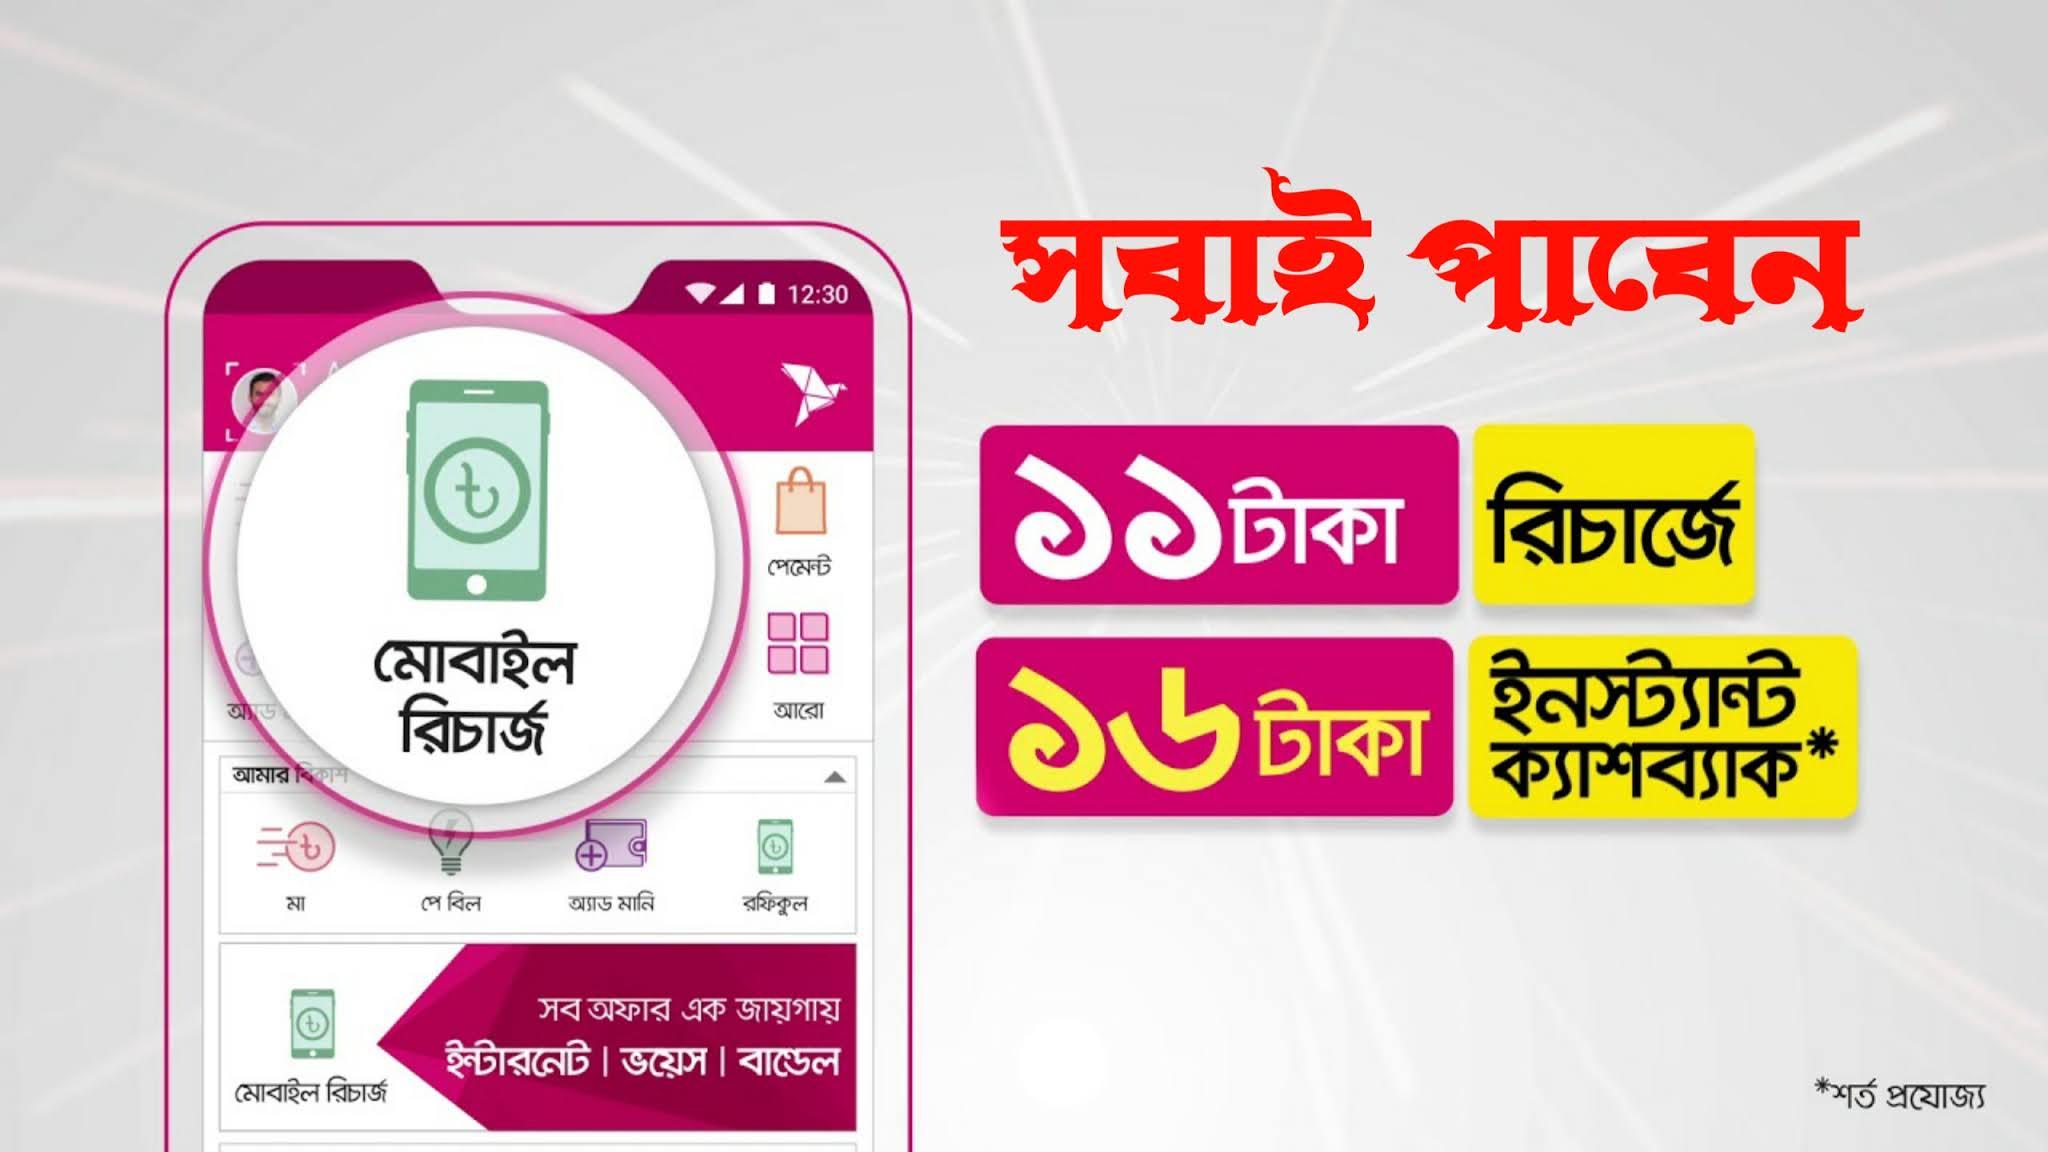 Bkash cash back offer !! বিকাশ অ্যাপে ১১ টাকা রিচার্জে ১৬ টাকা ক্যাশব্যাক !! Bkash offers